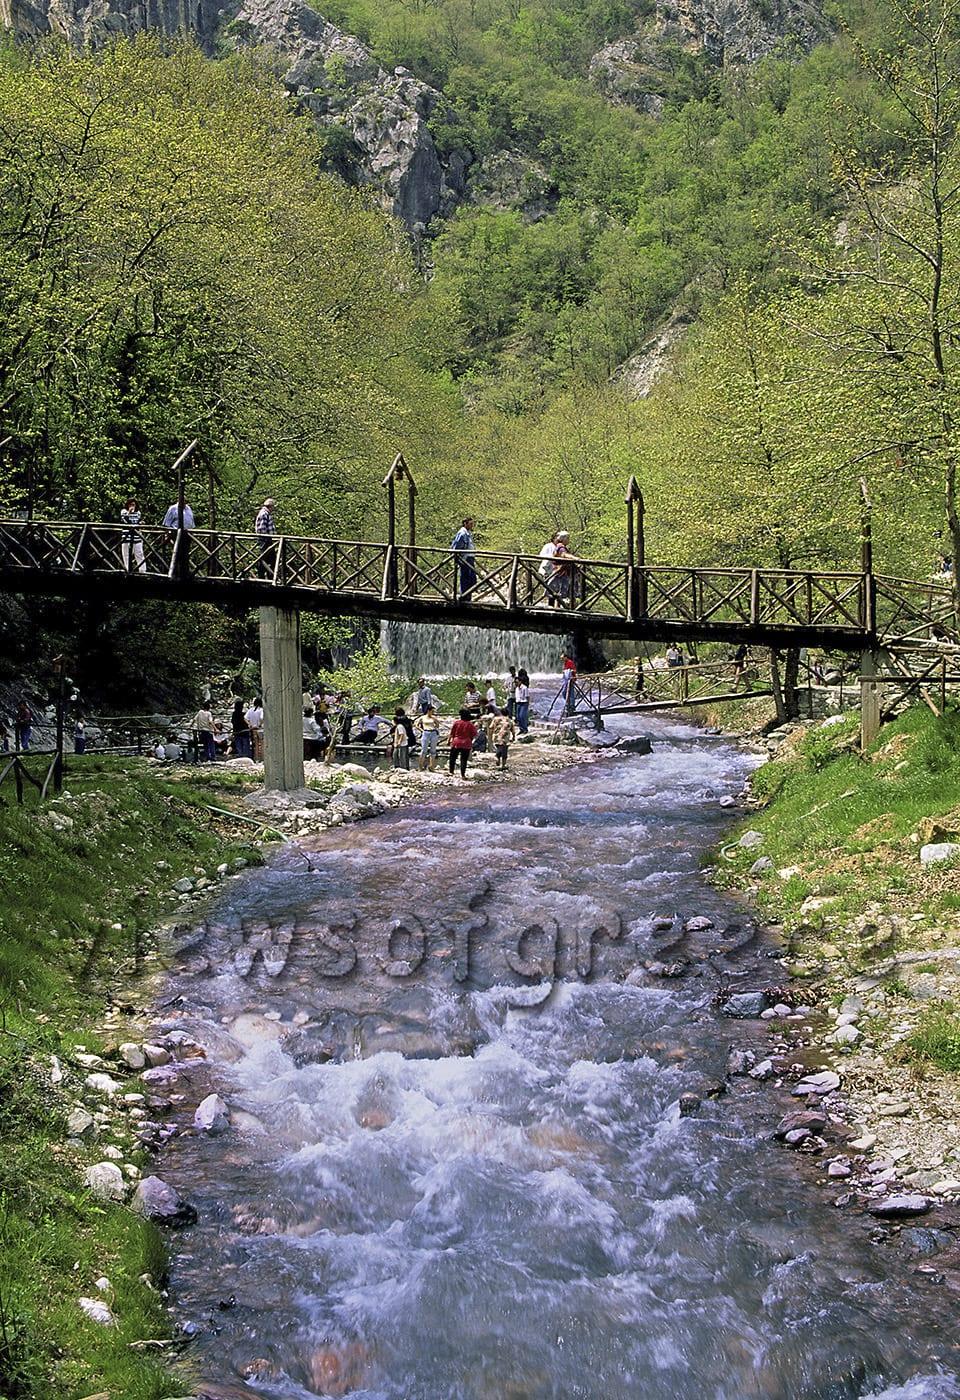 mountain, greece, mt. kaimaktsalan, greek, mt. voras, waterfall, springs, spa, thermal, Καμιμακτσαλάν, Λουτρά Ποζάρ, νομός Πέλλας, Άγιος Αθανάσιος, χιονοδρομικό κέντρο, λίμνη Άγρα, λίμνη Βεγορίτιδα,